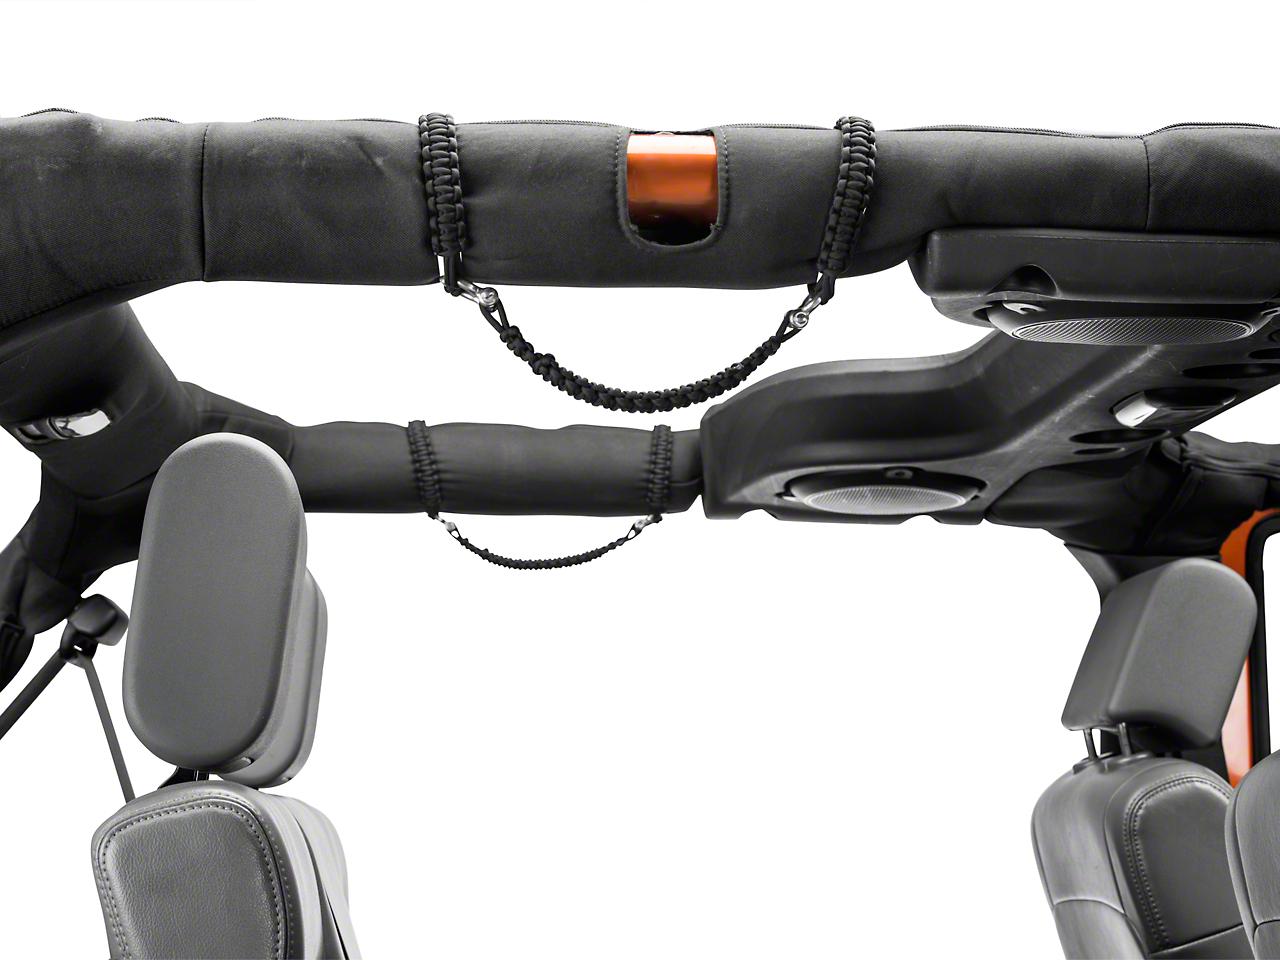 RedRock 4x4 Rear Rollbar Paracord Grab Handles with D-rings - Black (07-18 Wrangler JK 4 Door)